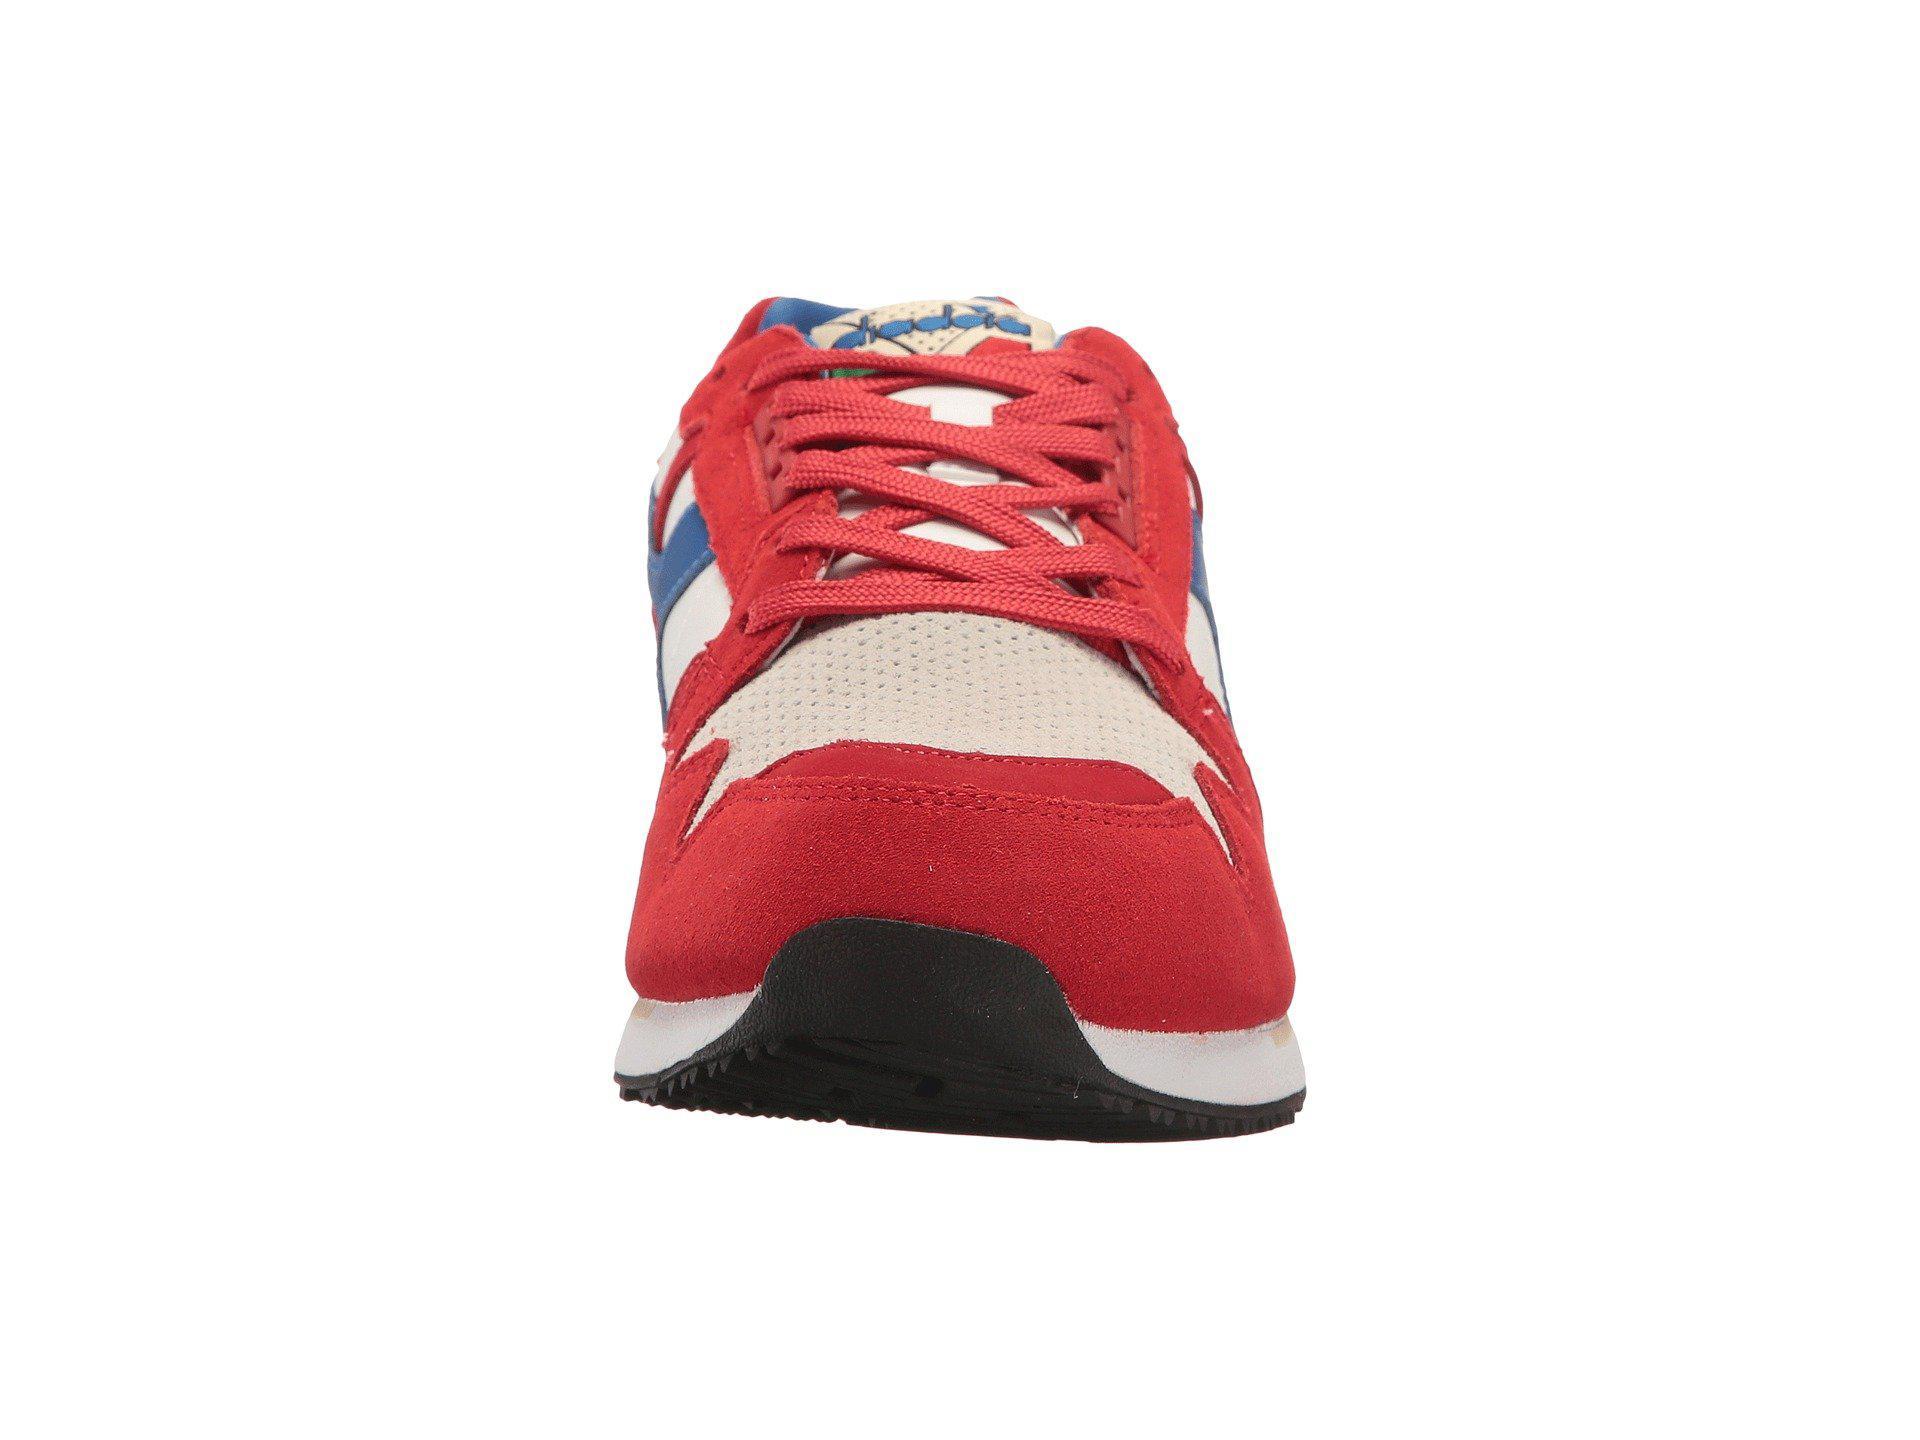 27f4e580b8 Diadora - Red I.c. 4000 Premium - Lyst. View fullscreen